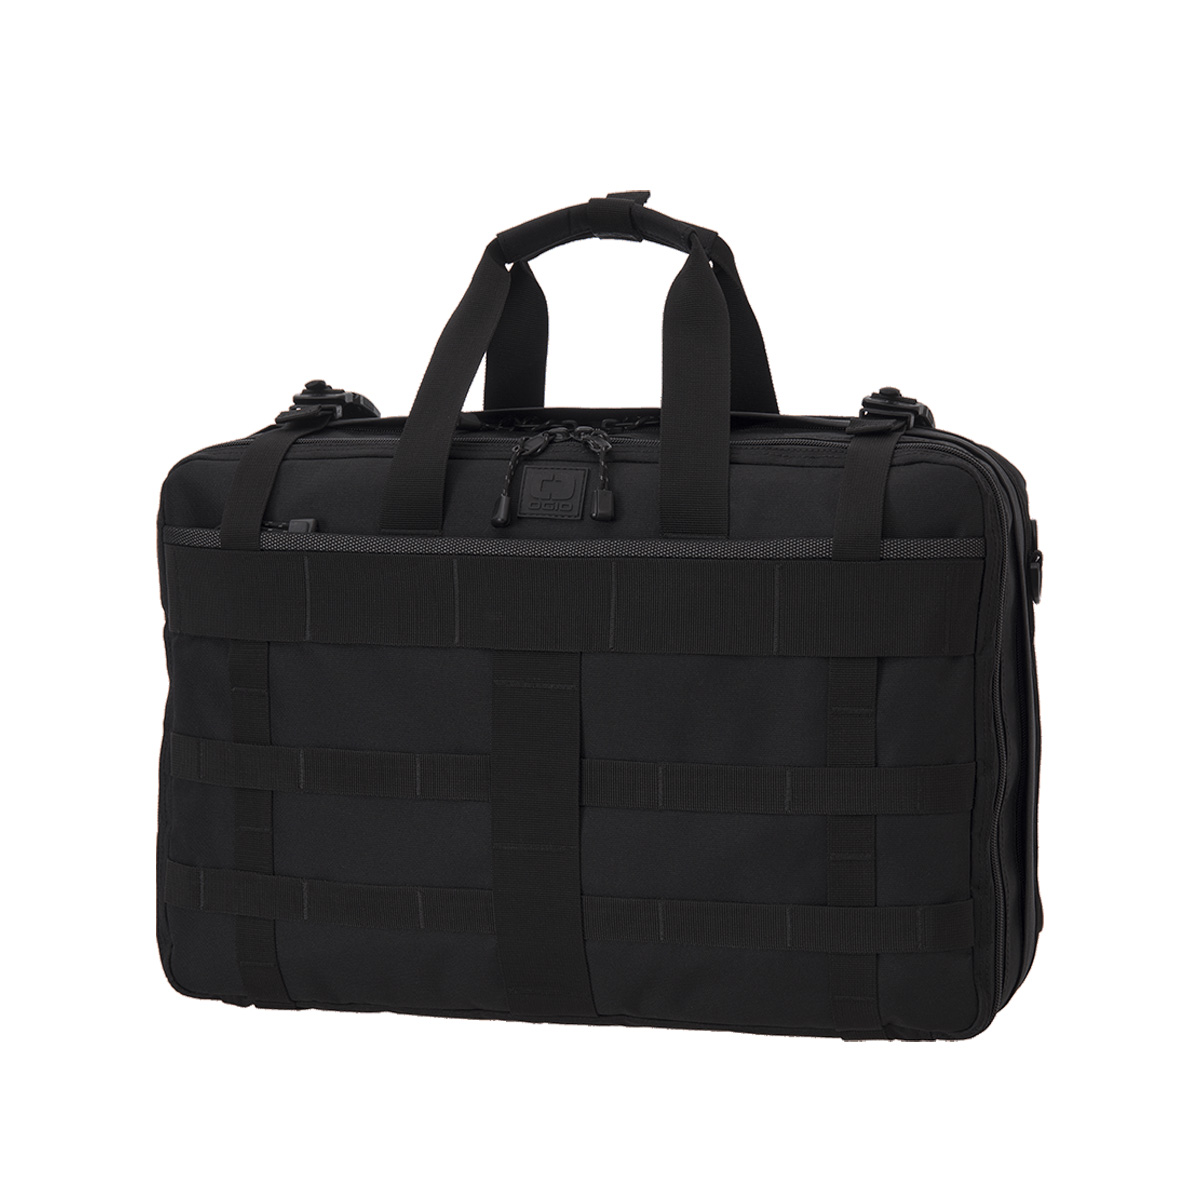 OGIO CORE CONVOY 3WAY BRIEF CASE LARGE BAG 20 JM オジオ バッグ ビジネスバッグ ブリーフケース メンズ 23L ブラック 黒 5920155OG